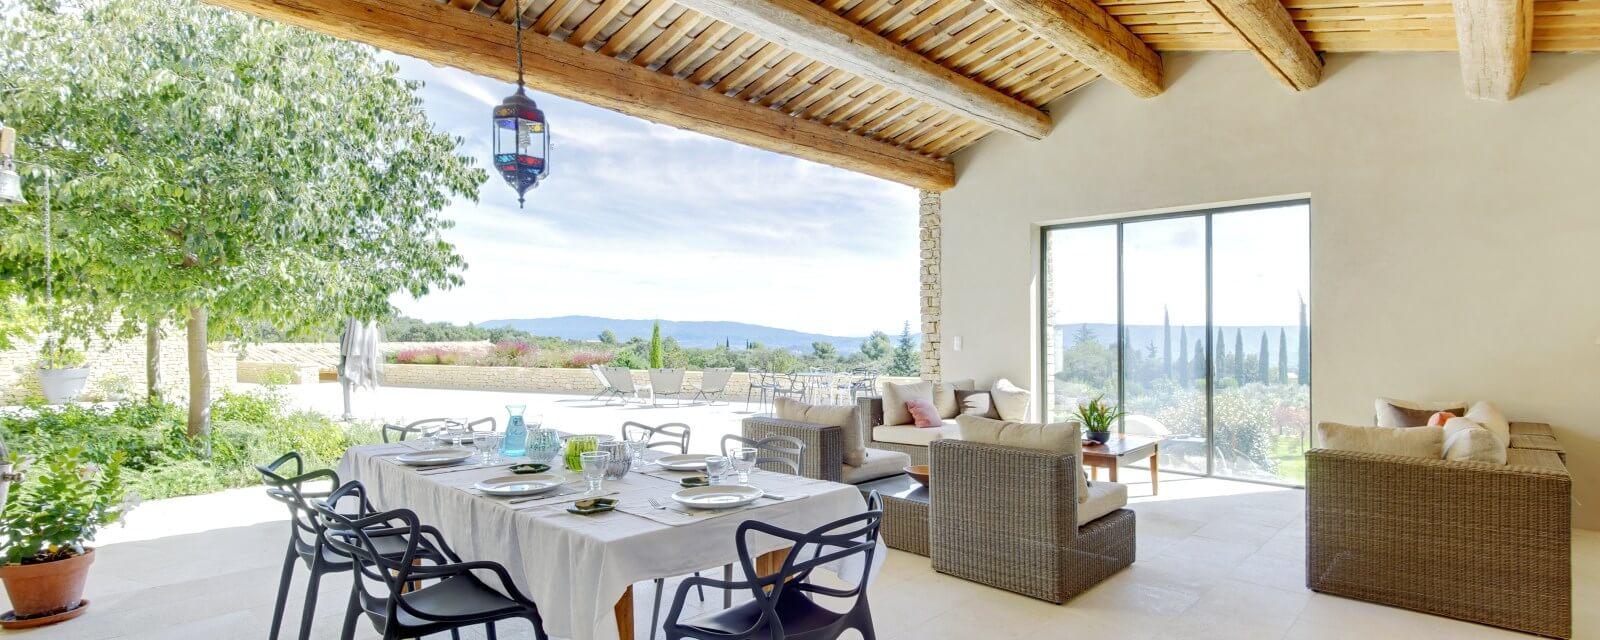 LA BASTIDE BLANCHE | Luxus Ferienhaus Provence | LANDMARK